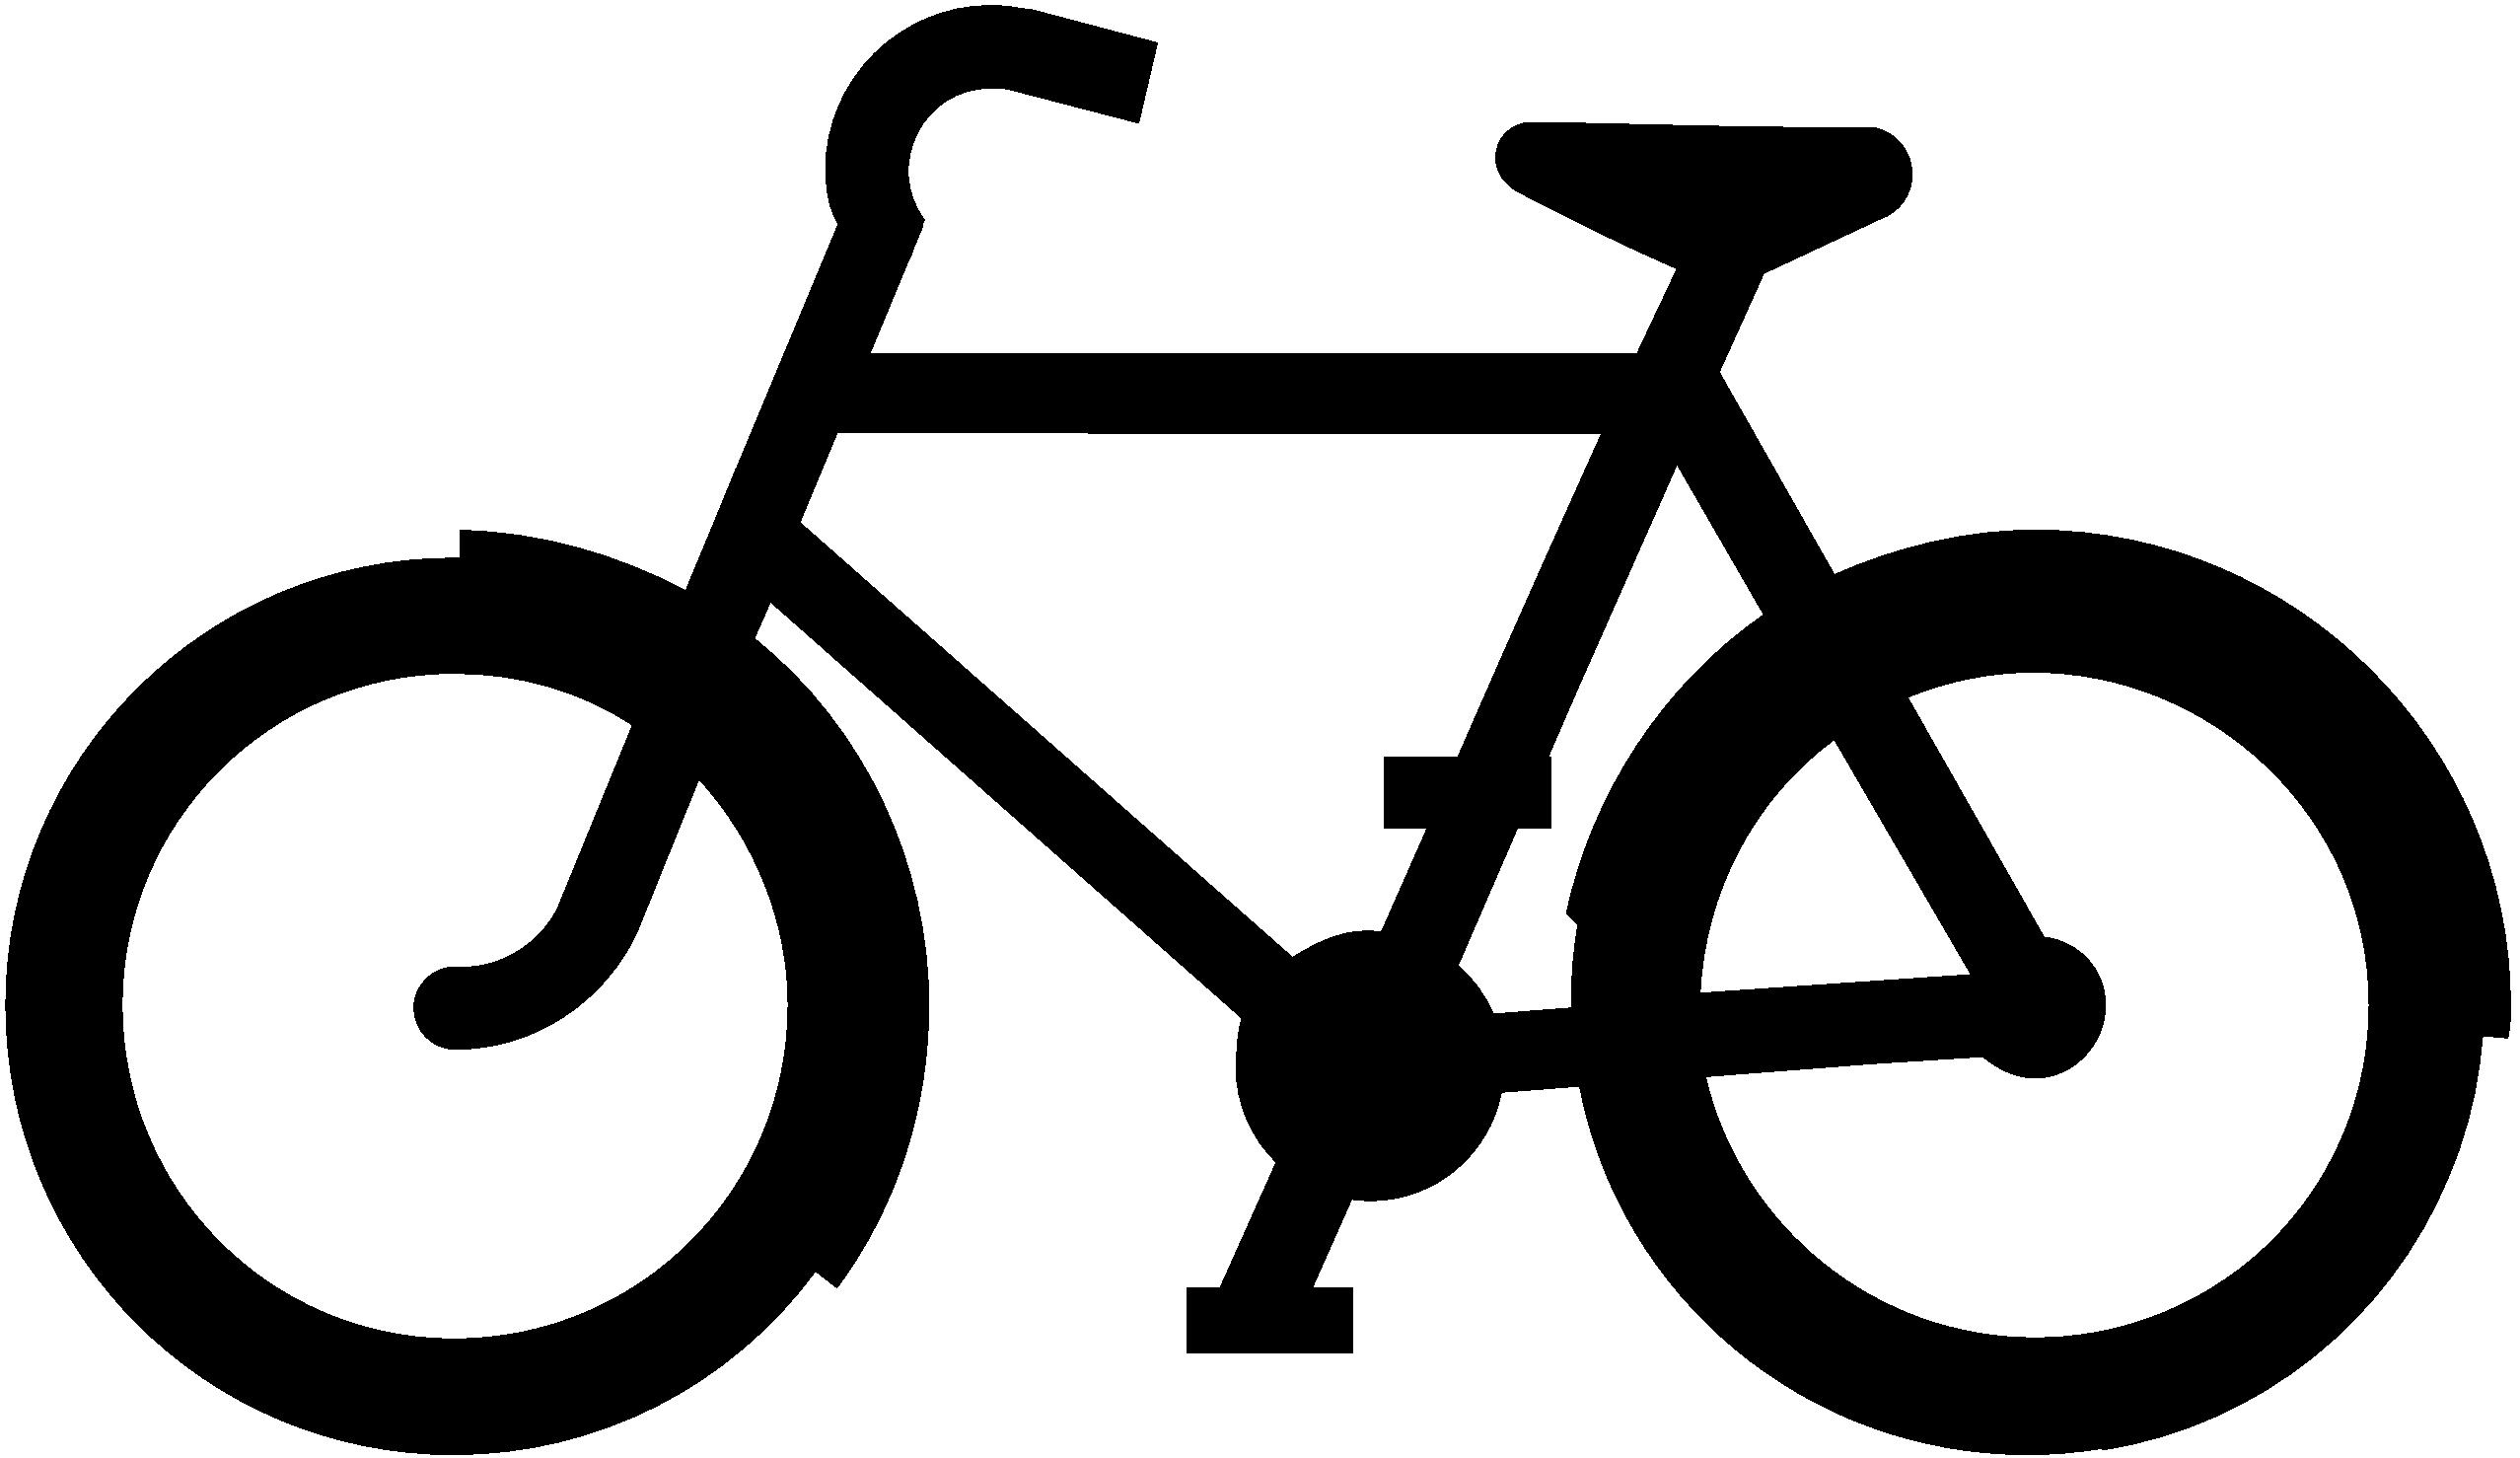 2555x1478 Black And White Kites Clip Art